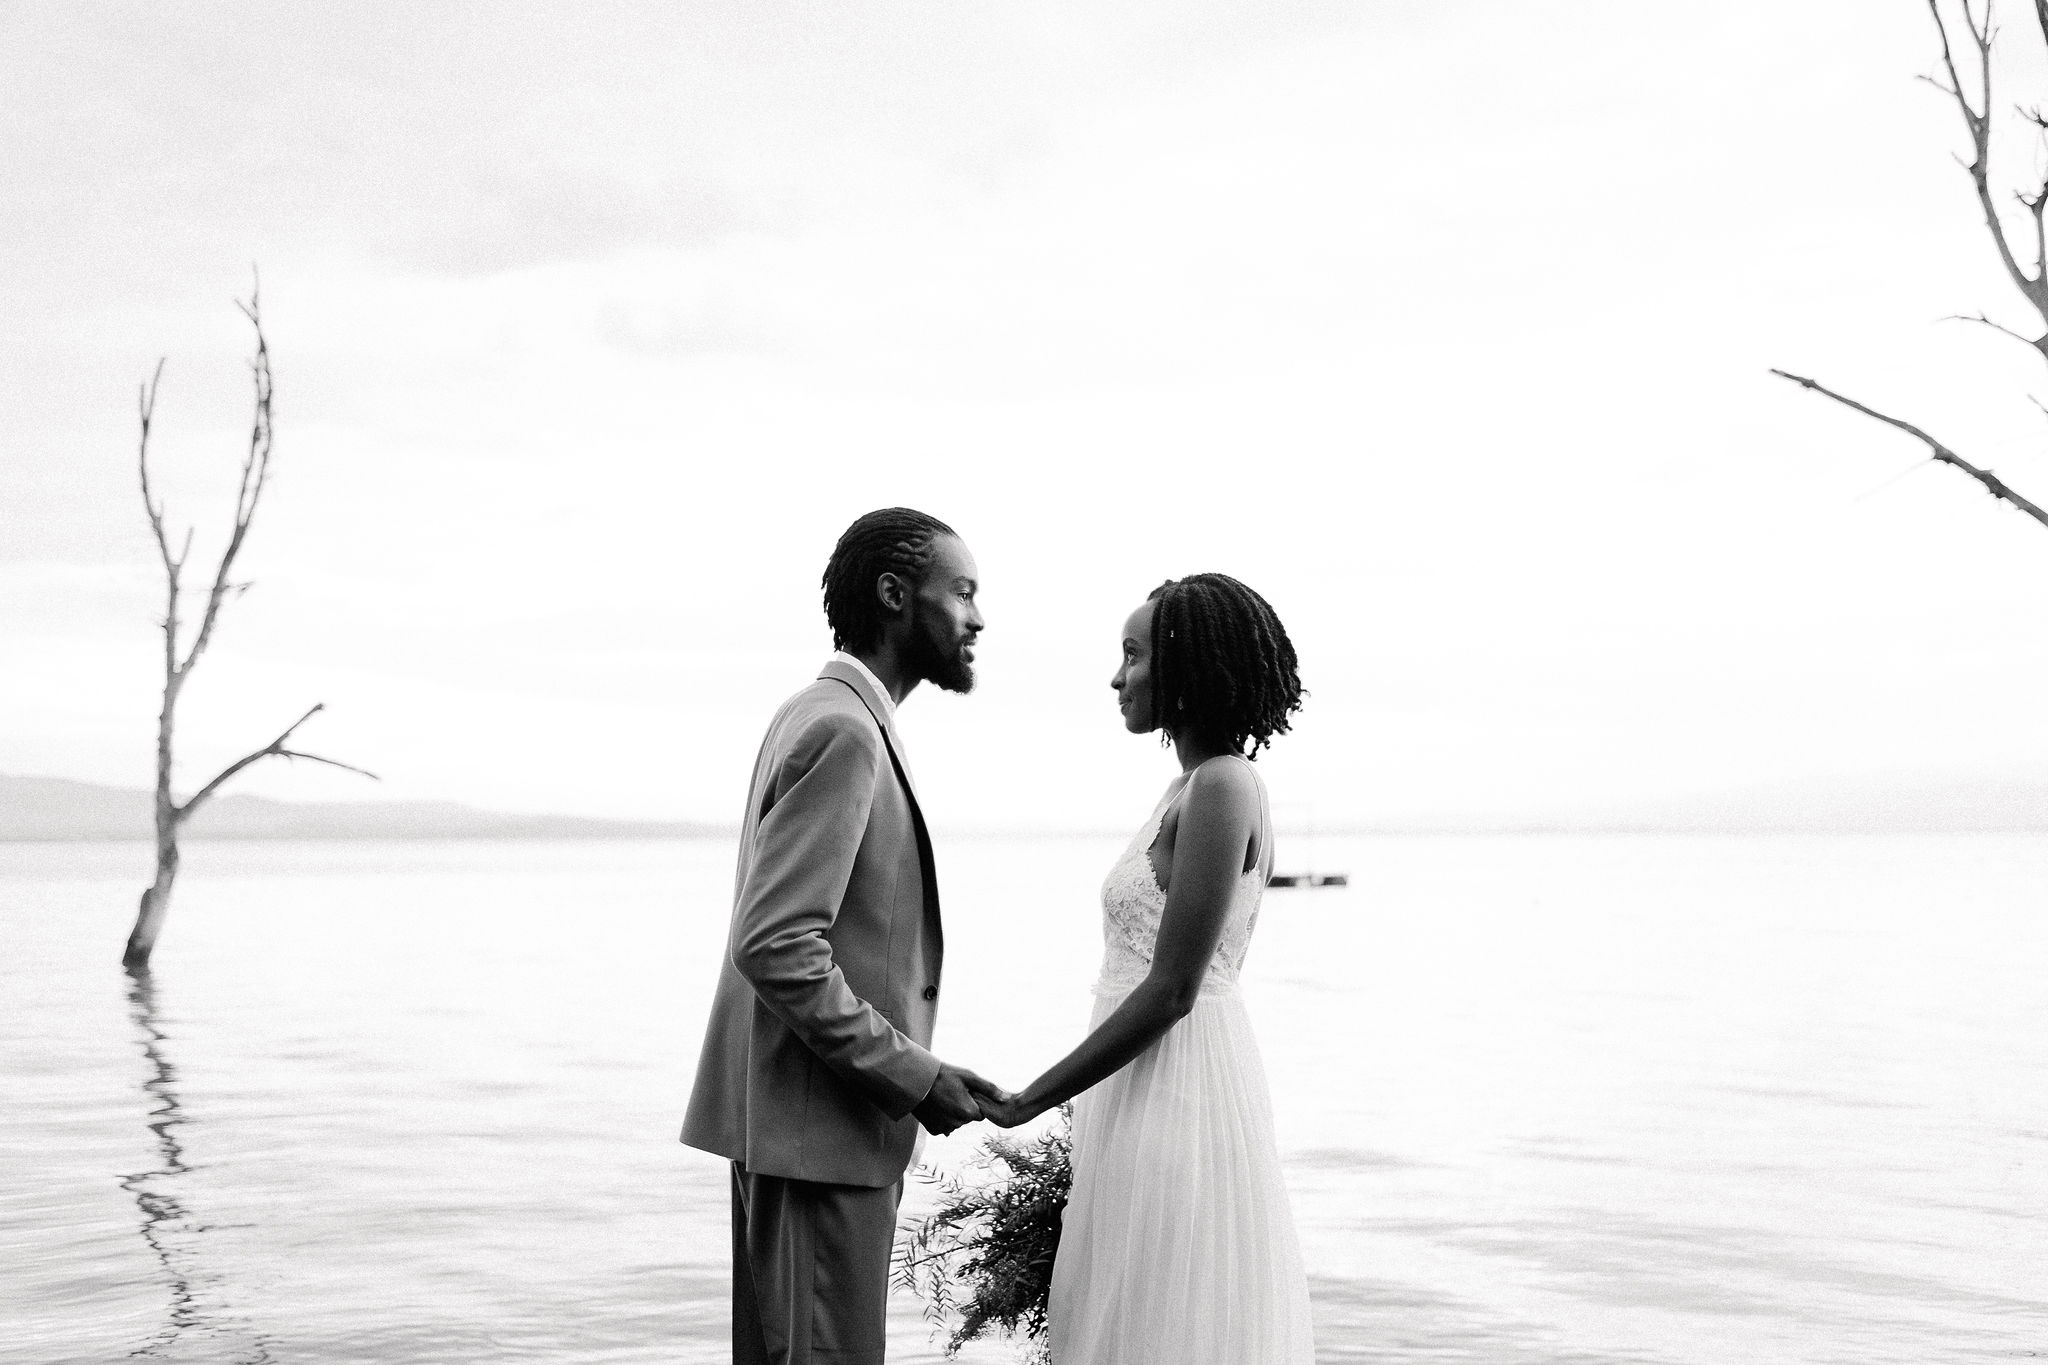 Anna-Hari-Photography-Destination-Wedding-Photographer-Kenya-77.jpg